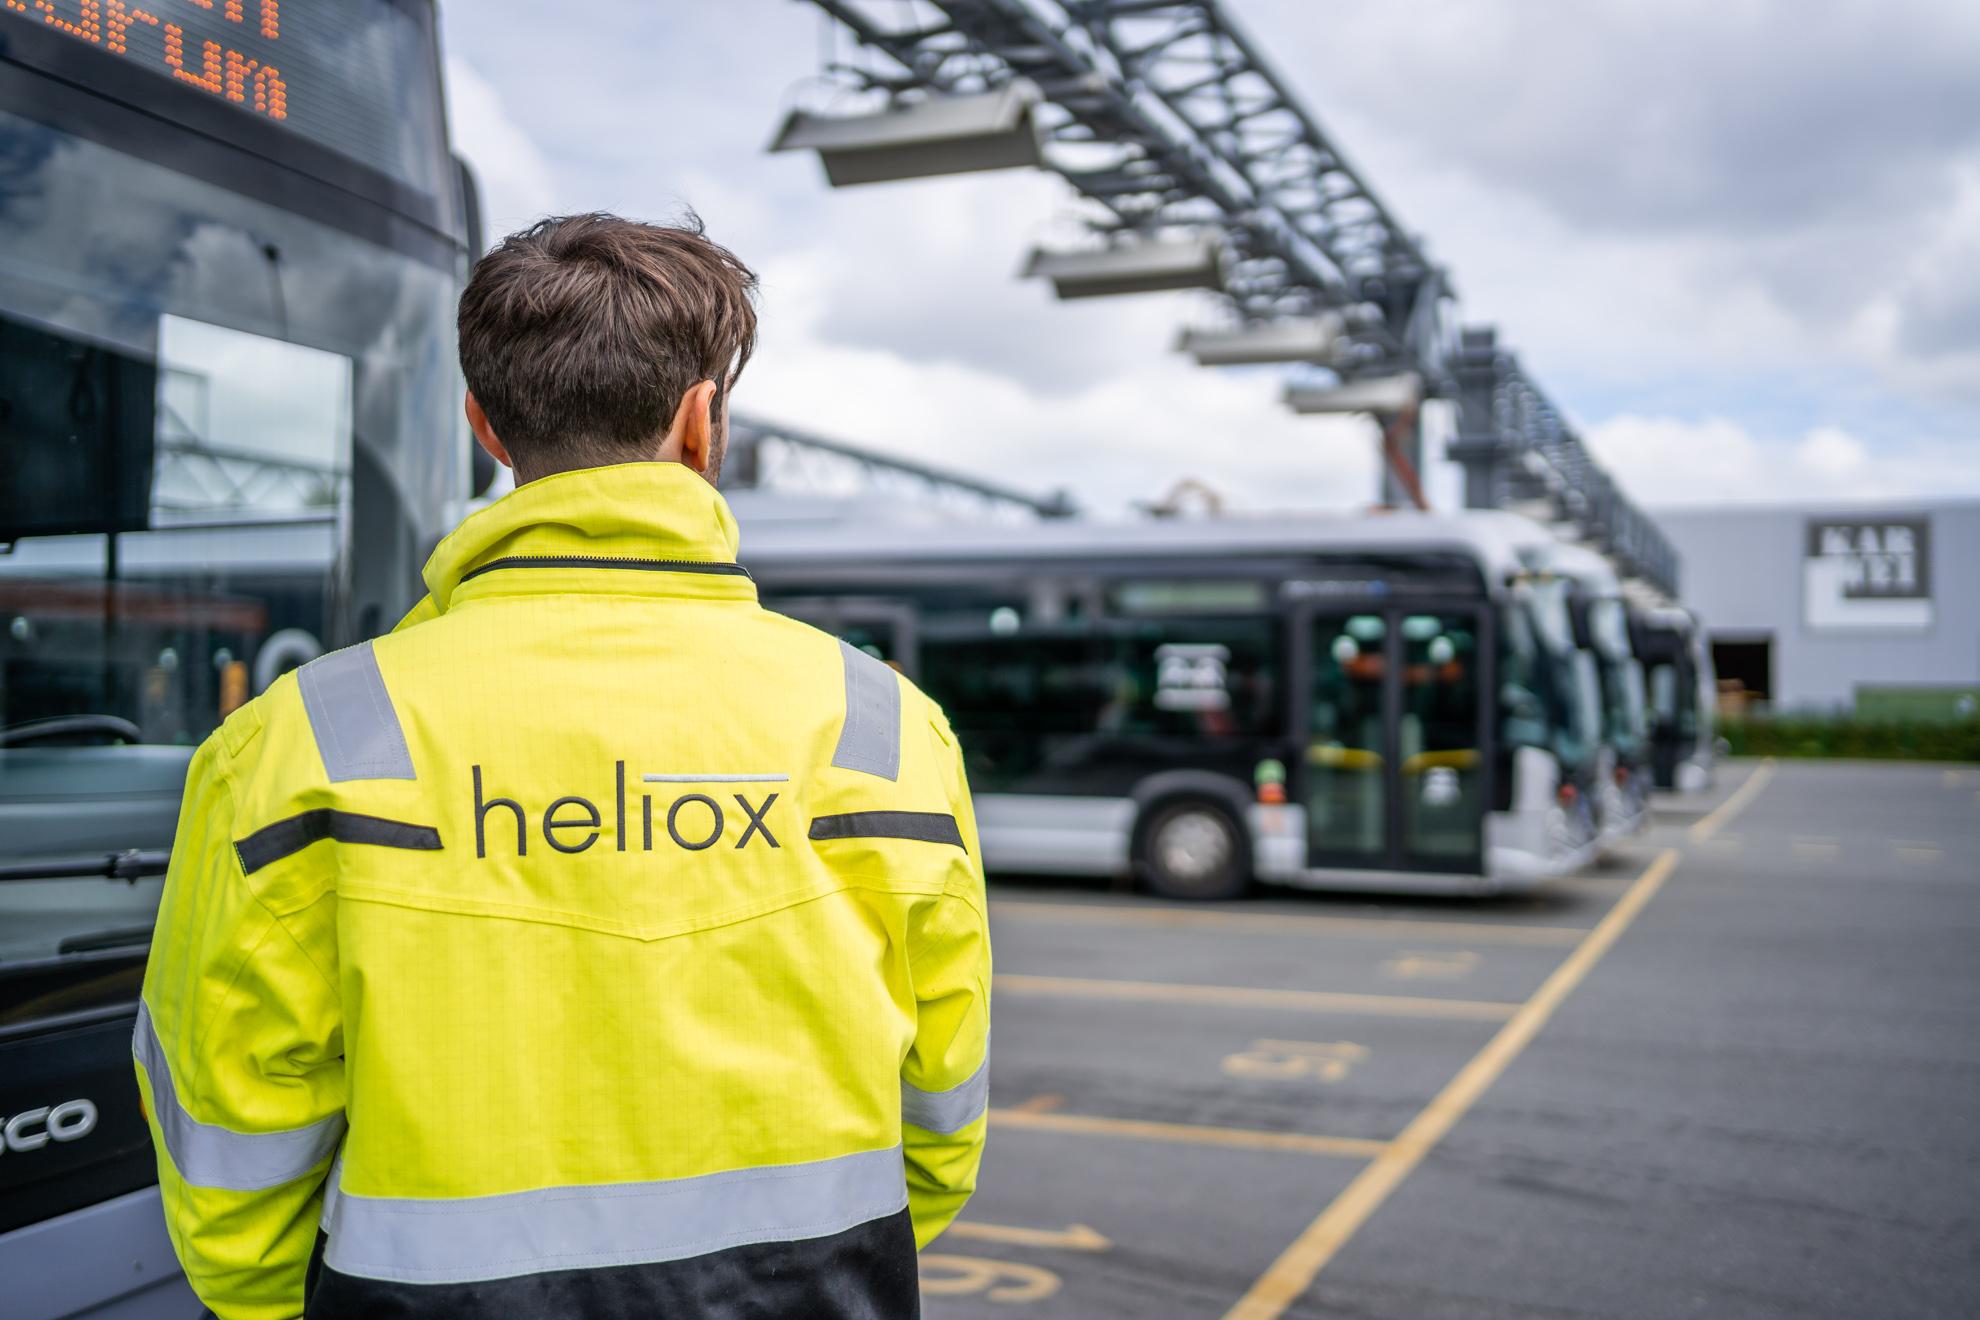 Man conducting himself at Heliox station